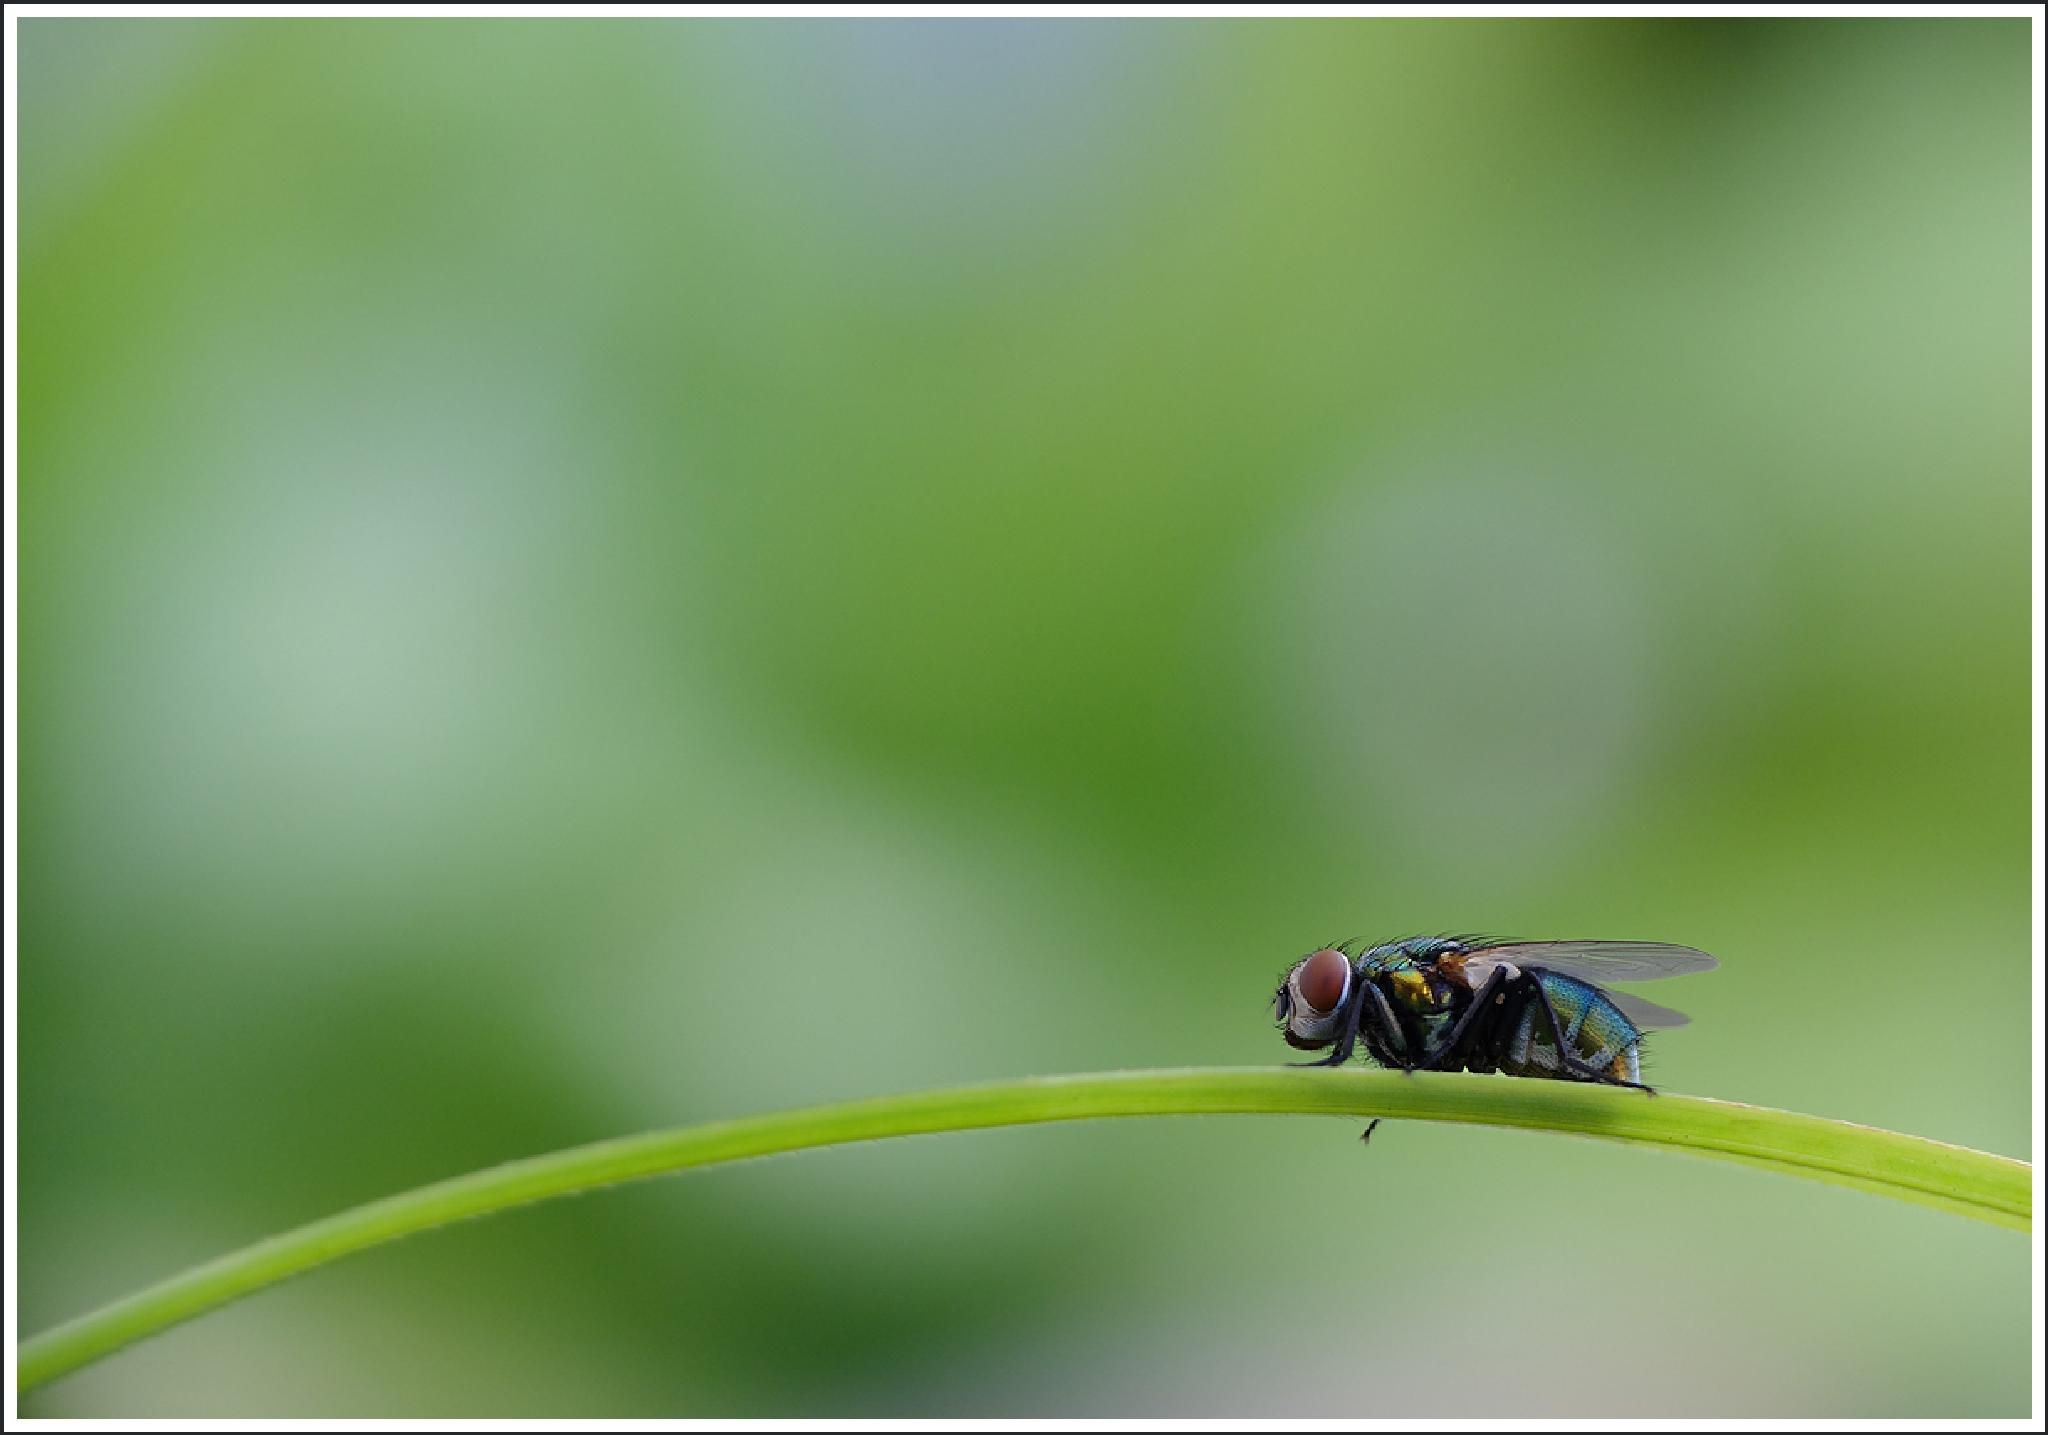 The Fly by Ali Hoolash